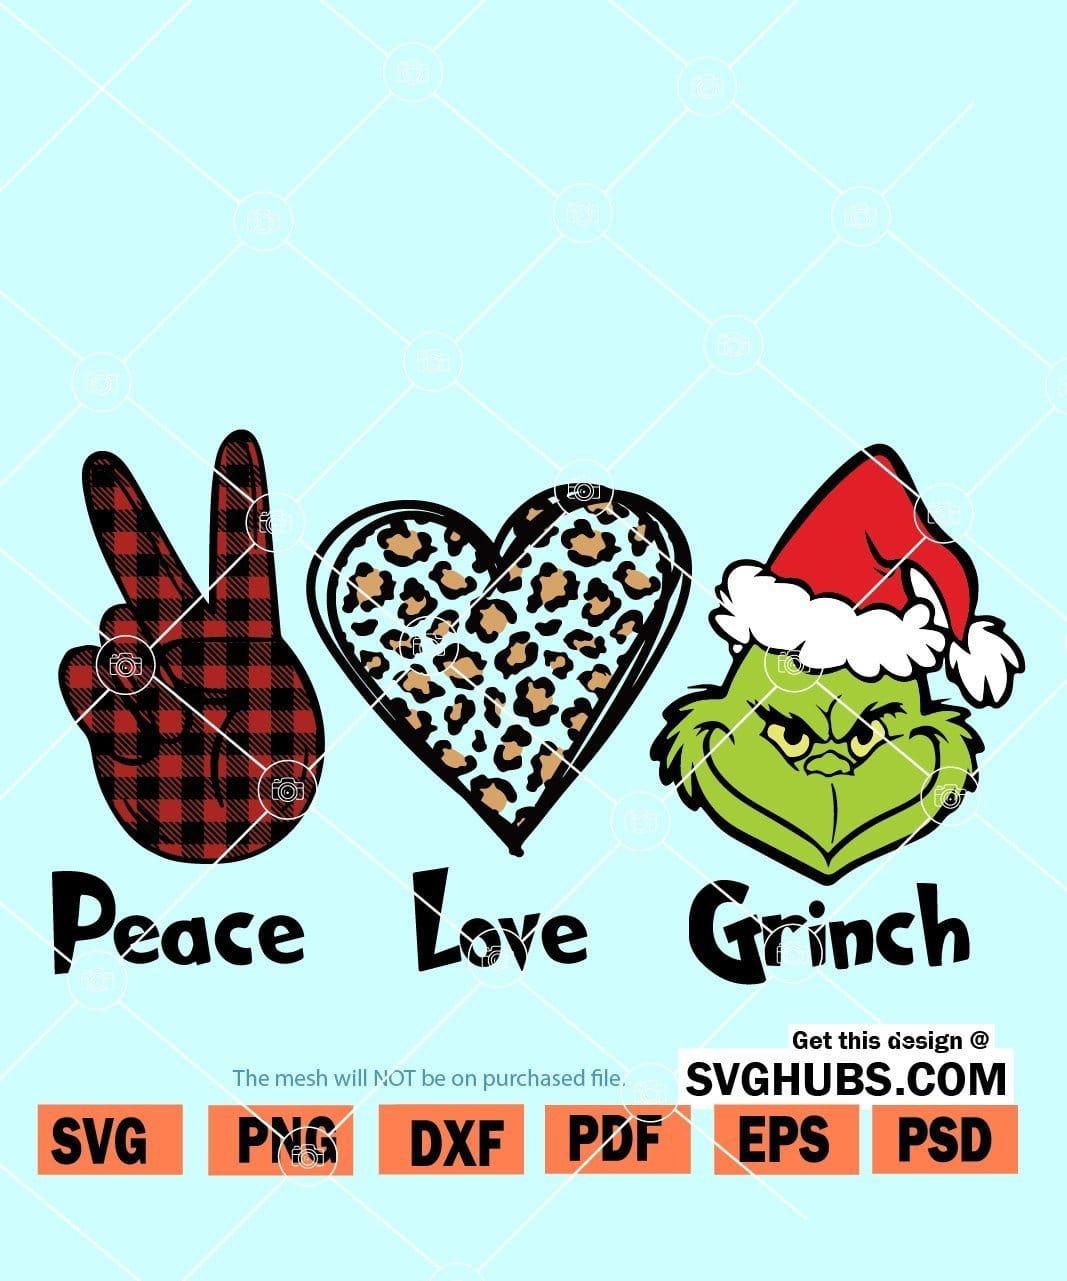 Grinch Svg Free : grinch, Peace, Grinch, Christmas